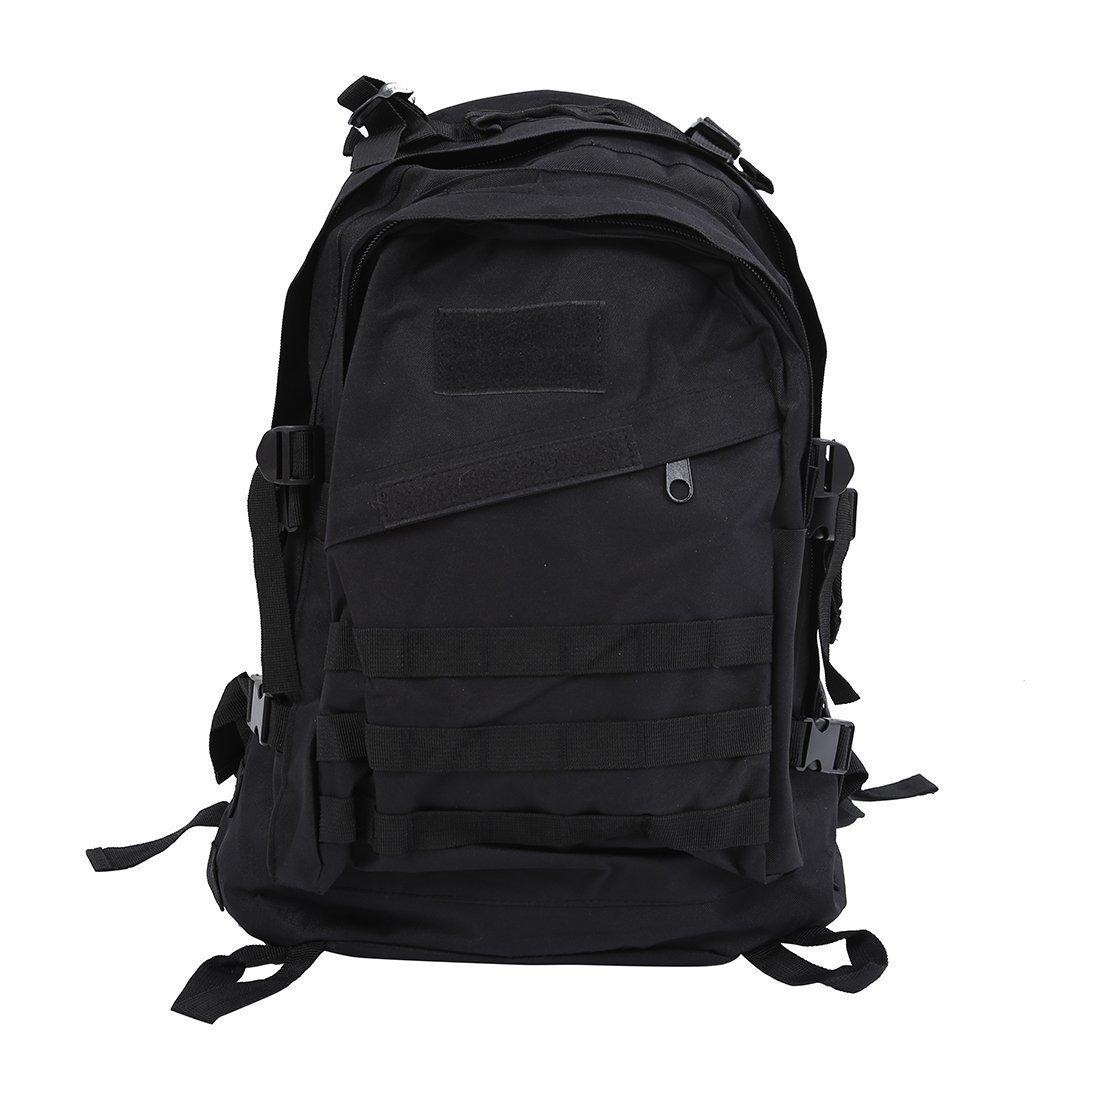 Backpack - TOOGOO(R) Outdoor 40L 600D Waterproof Oxford Cloth Military Rucksack Tactical Backpack Bag ACU Camouflage Sports Travelling Hiking Bag Black